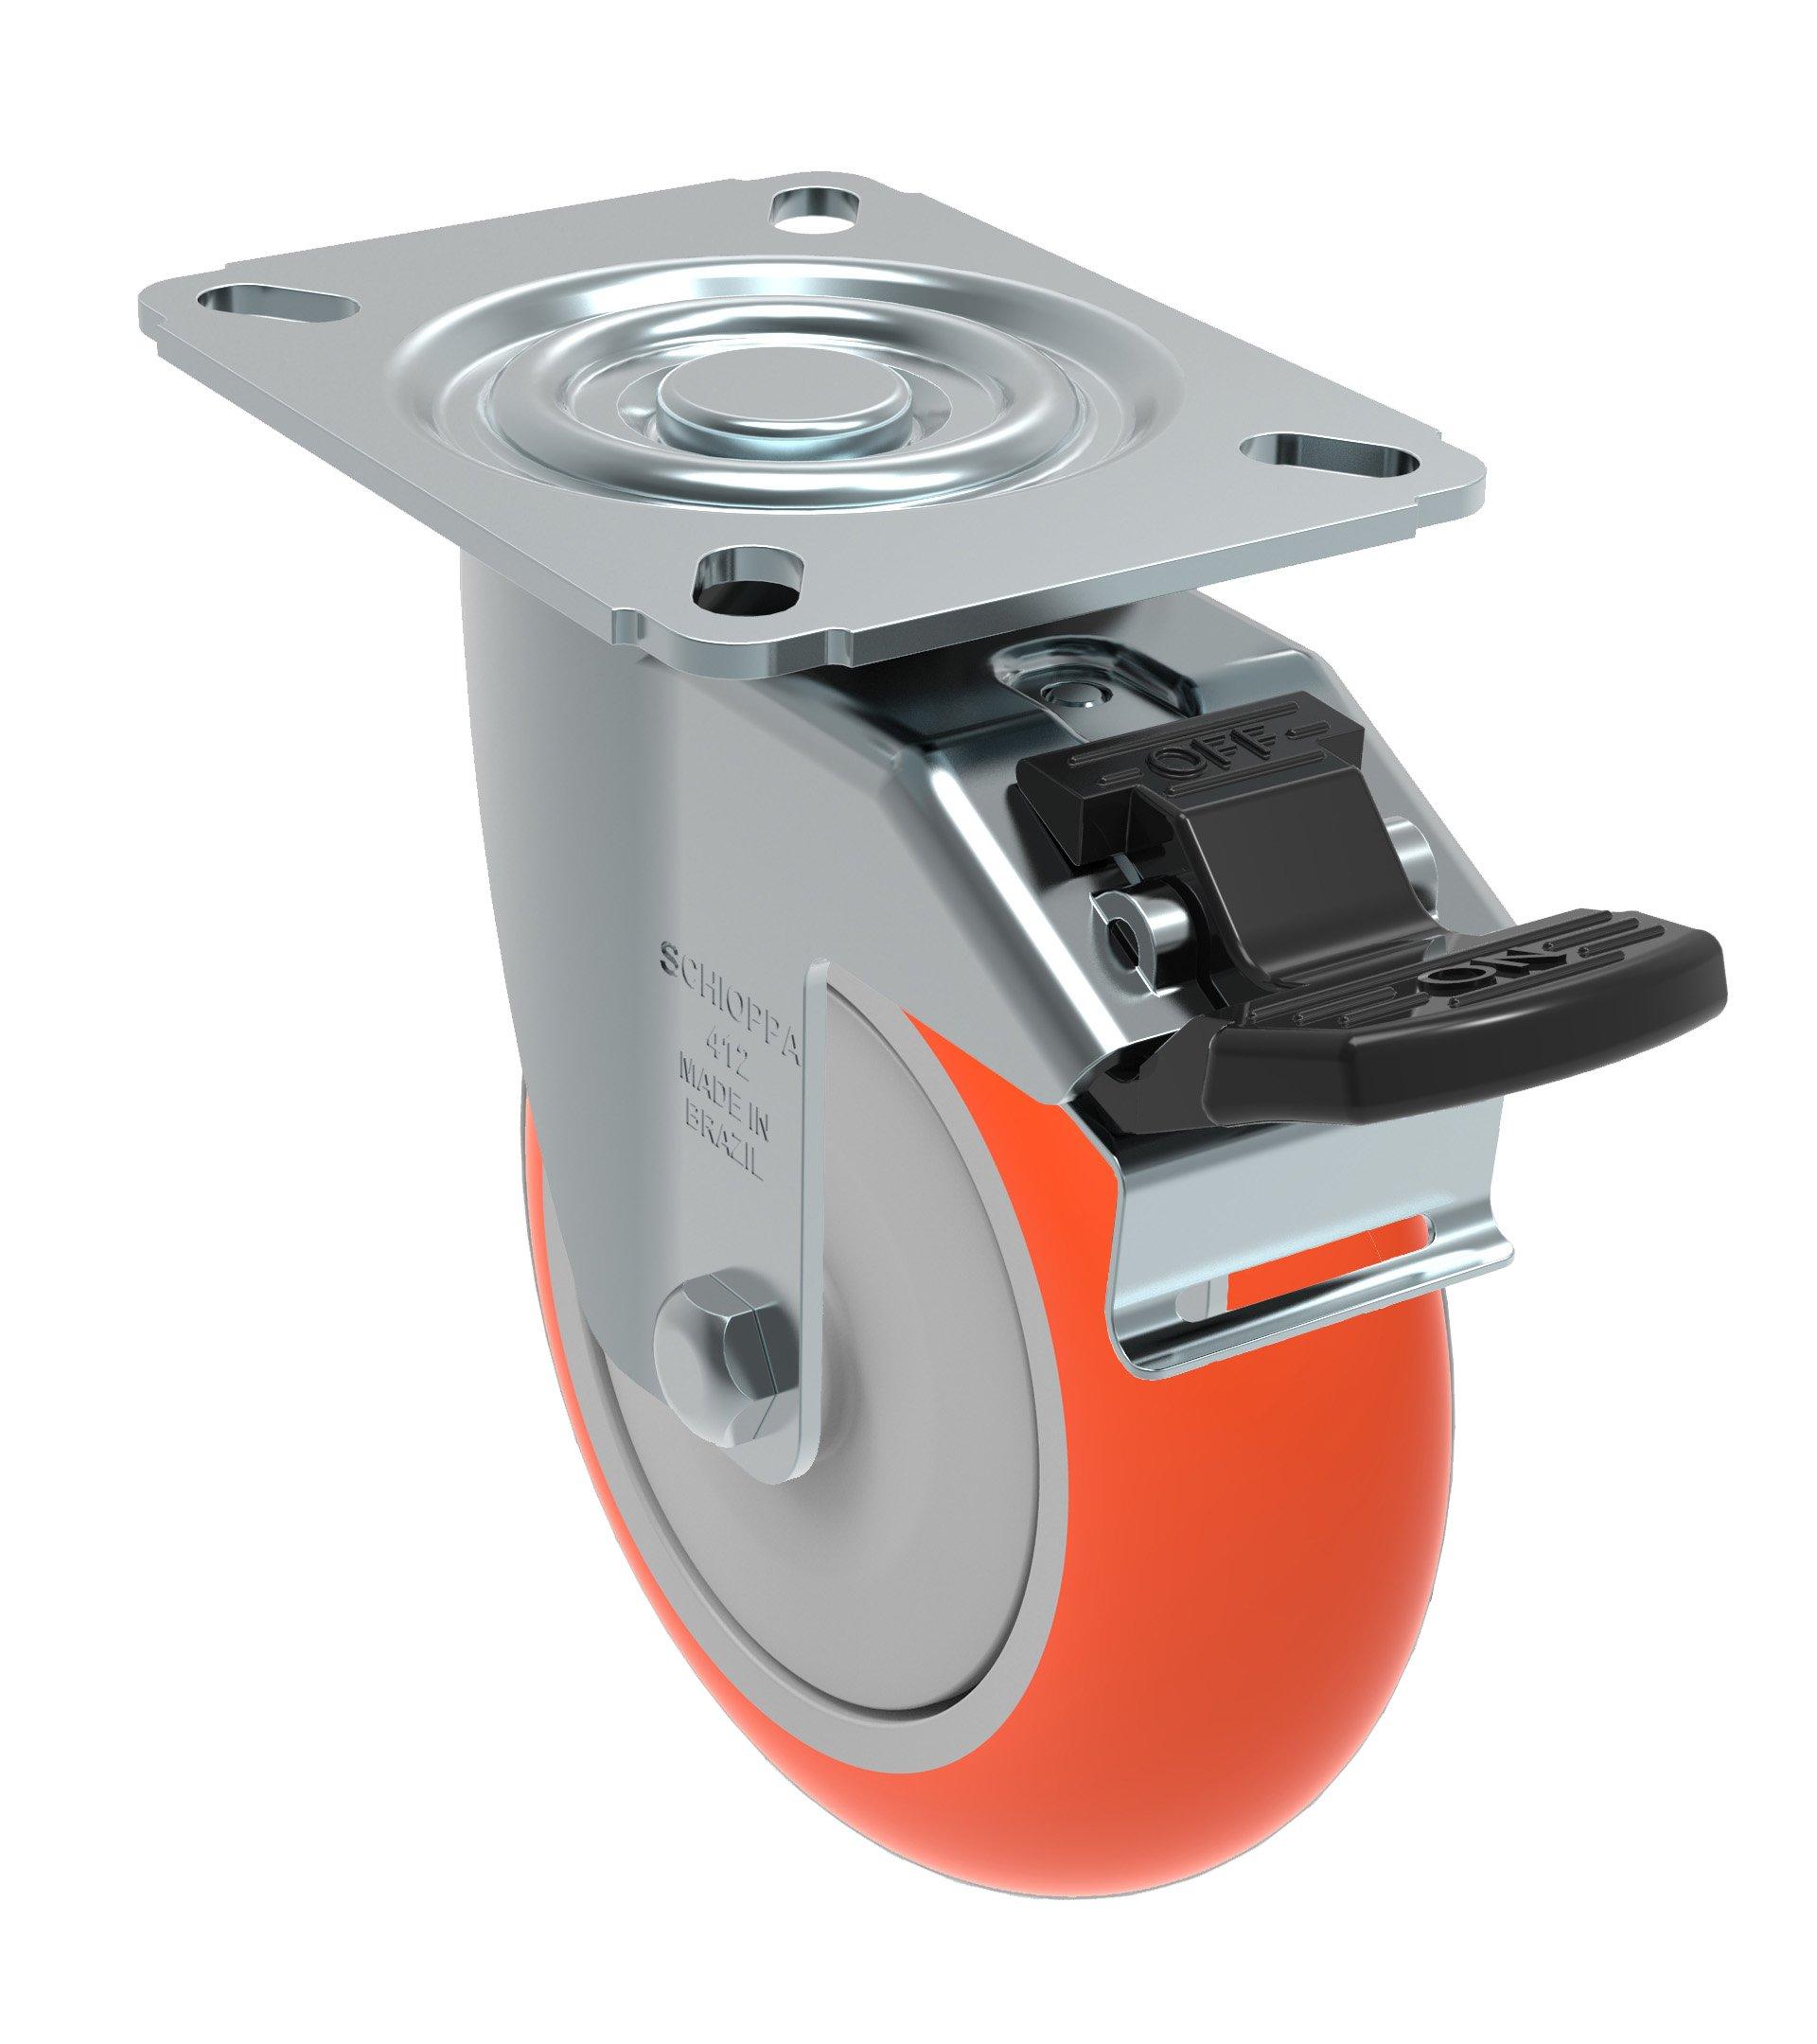 Schioppa GL 412 UPE G L12 Series 4'' x 1-1/4 Diameter Swivel Caster with Total Lock Brake, Non-Marking Polyurethane Precision Ball Bearing Wheel, Plate 3-1/8 x 4-1/8 (Bolt Holes 3-1/8 x 2-1/4), 275 lb